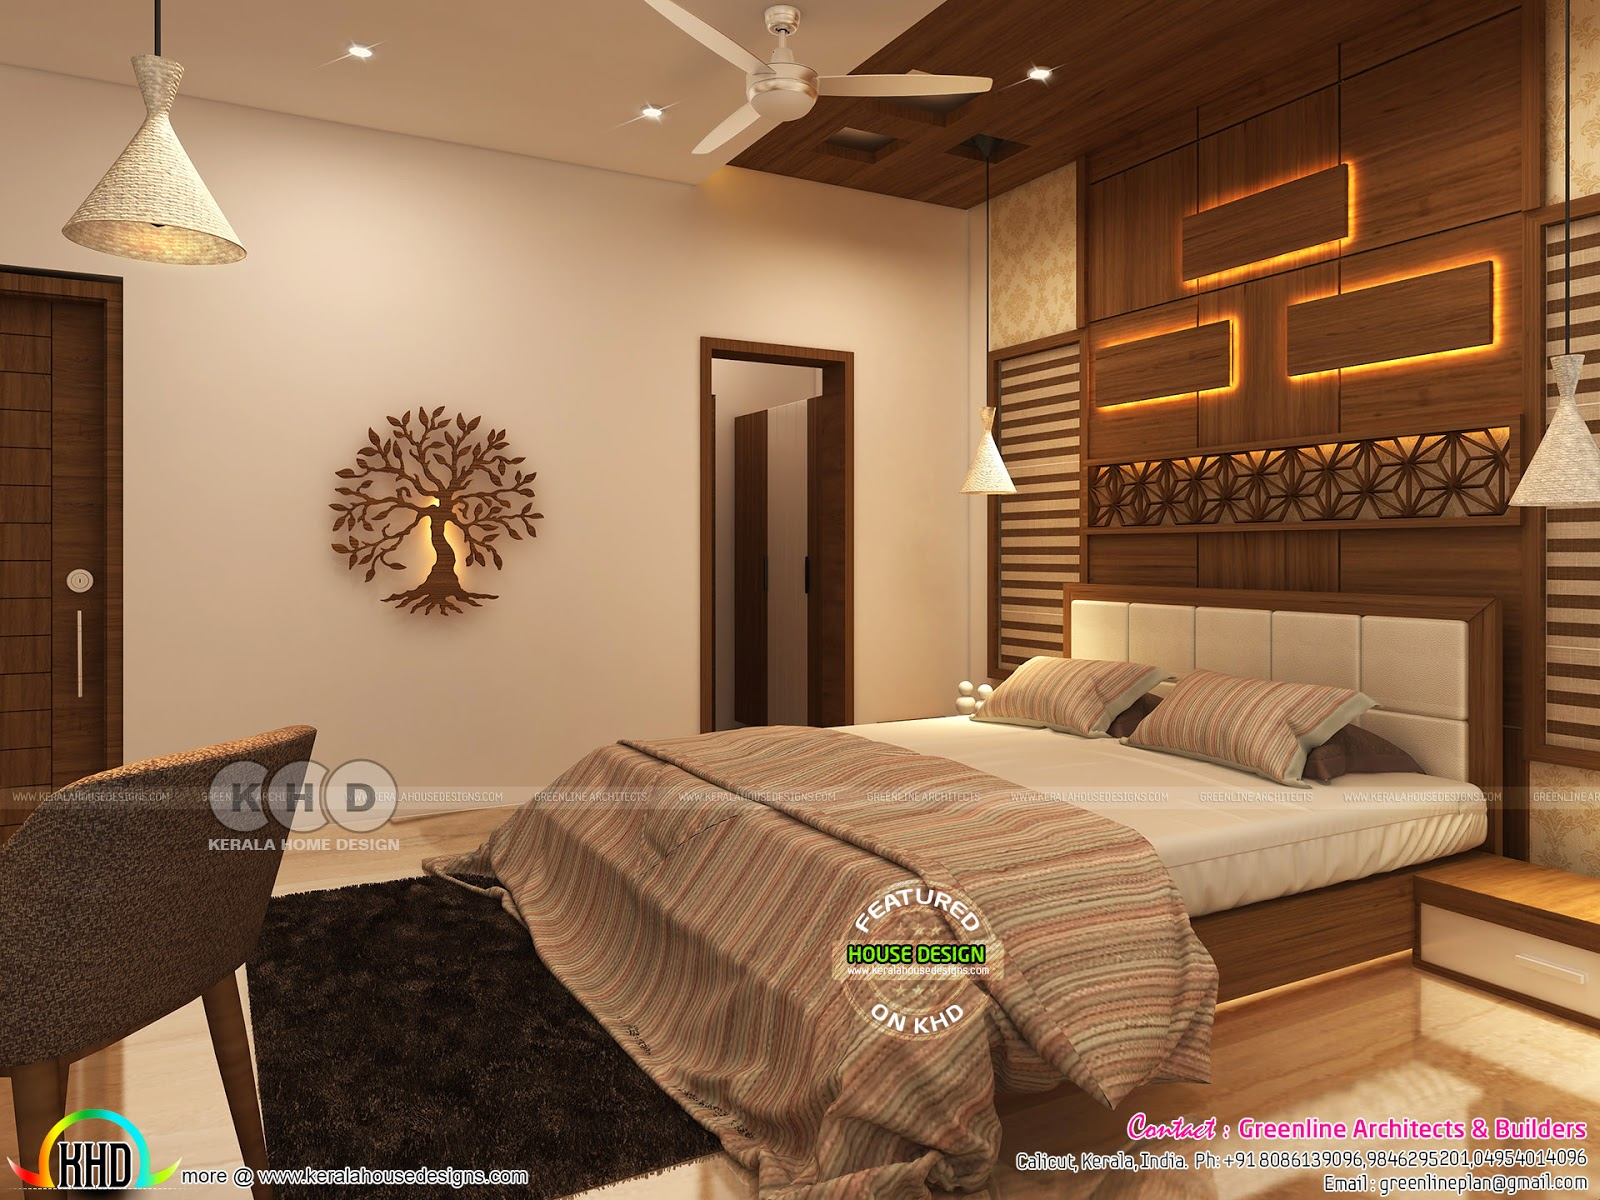 Modern Kerala interior designs November 2018 - Kerala home ...